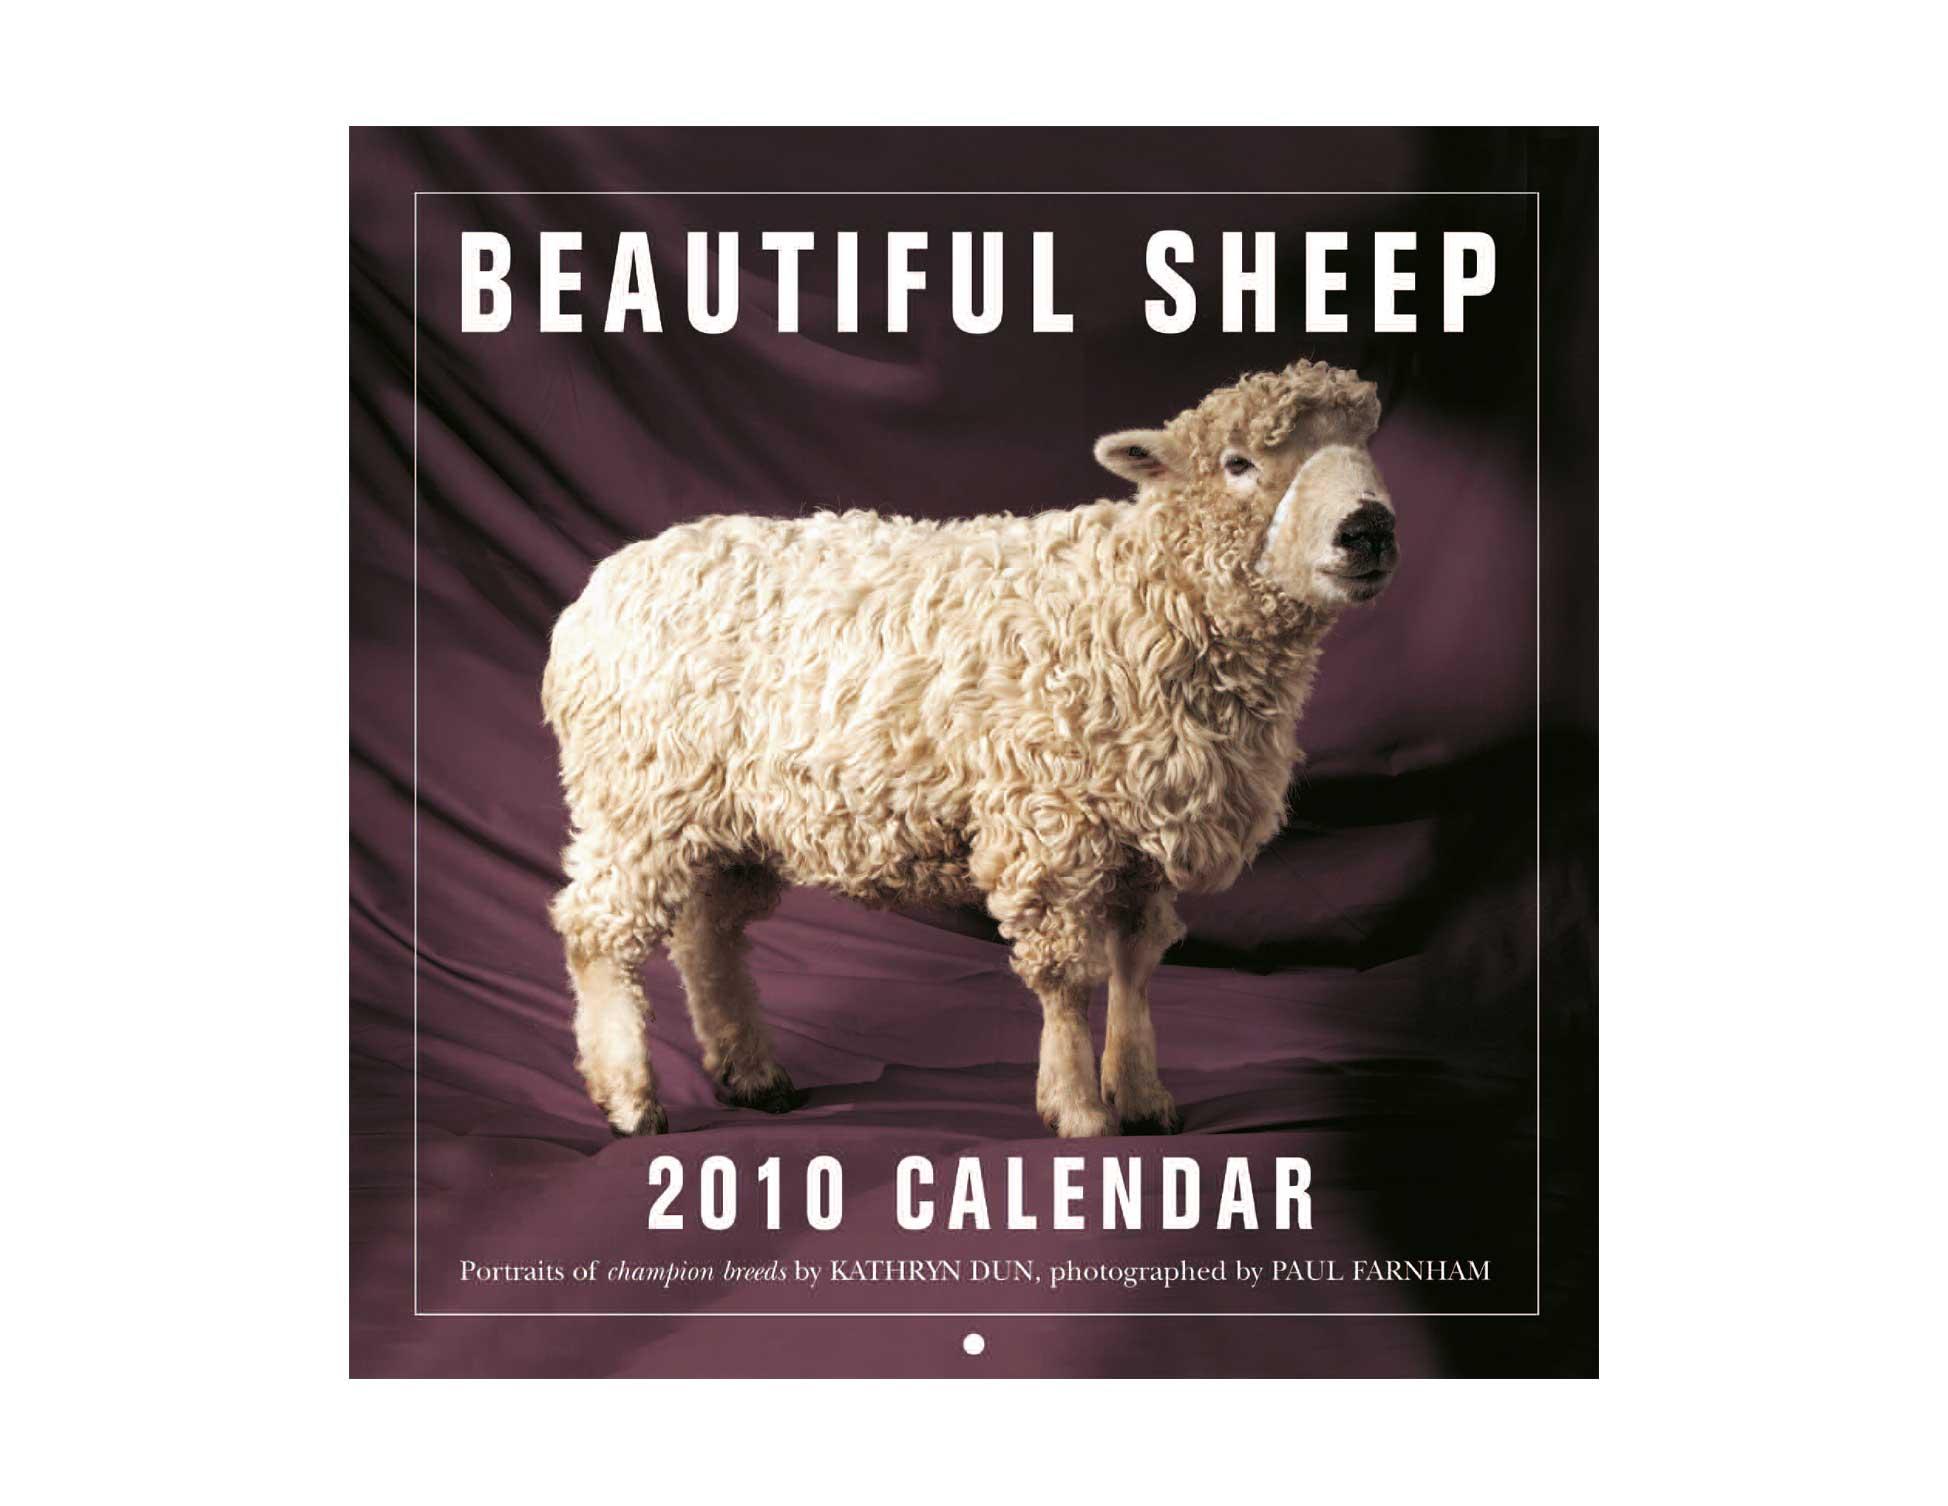 Beautiful Sheep Calendar Cover